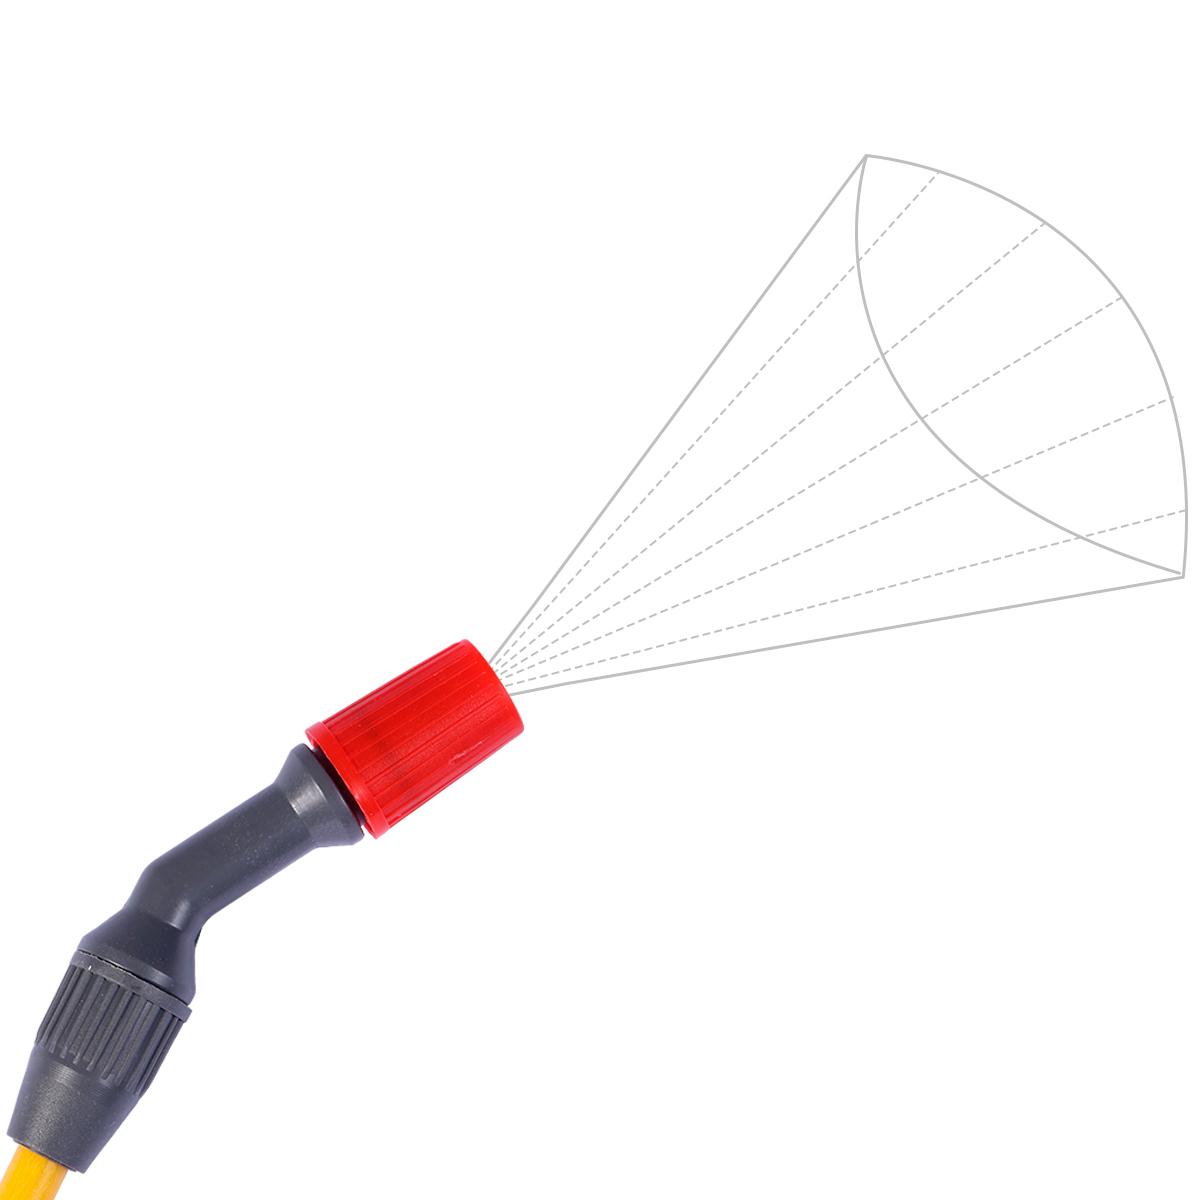 Kit 3 Unidades Pulverizador Manual SAPPA8L de Pressão Acumulada 8 Litros